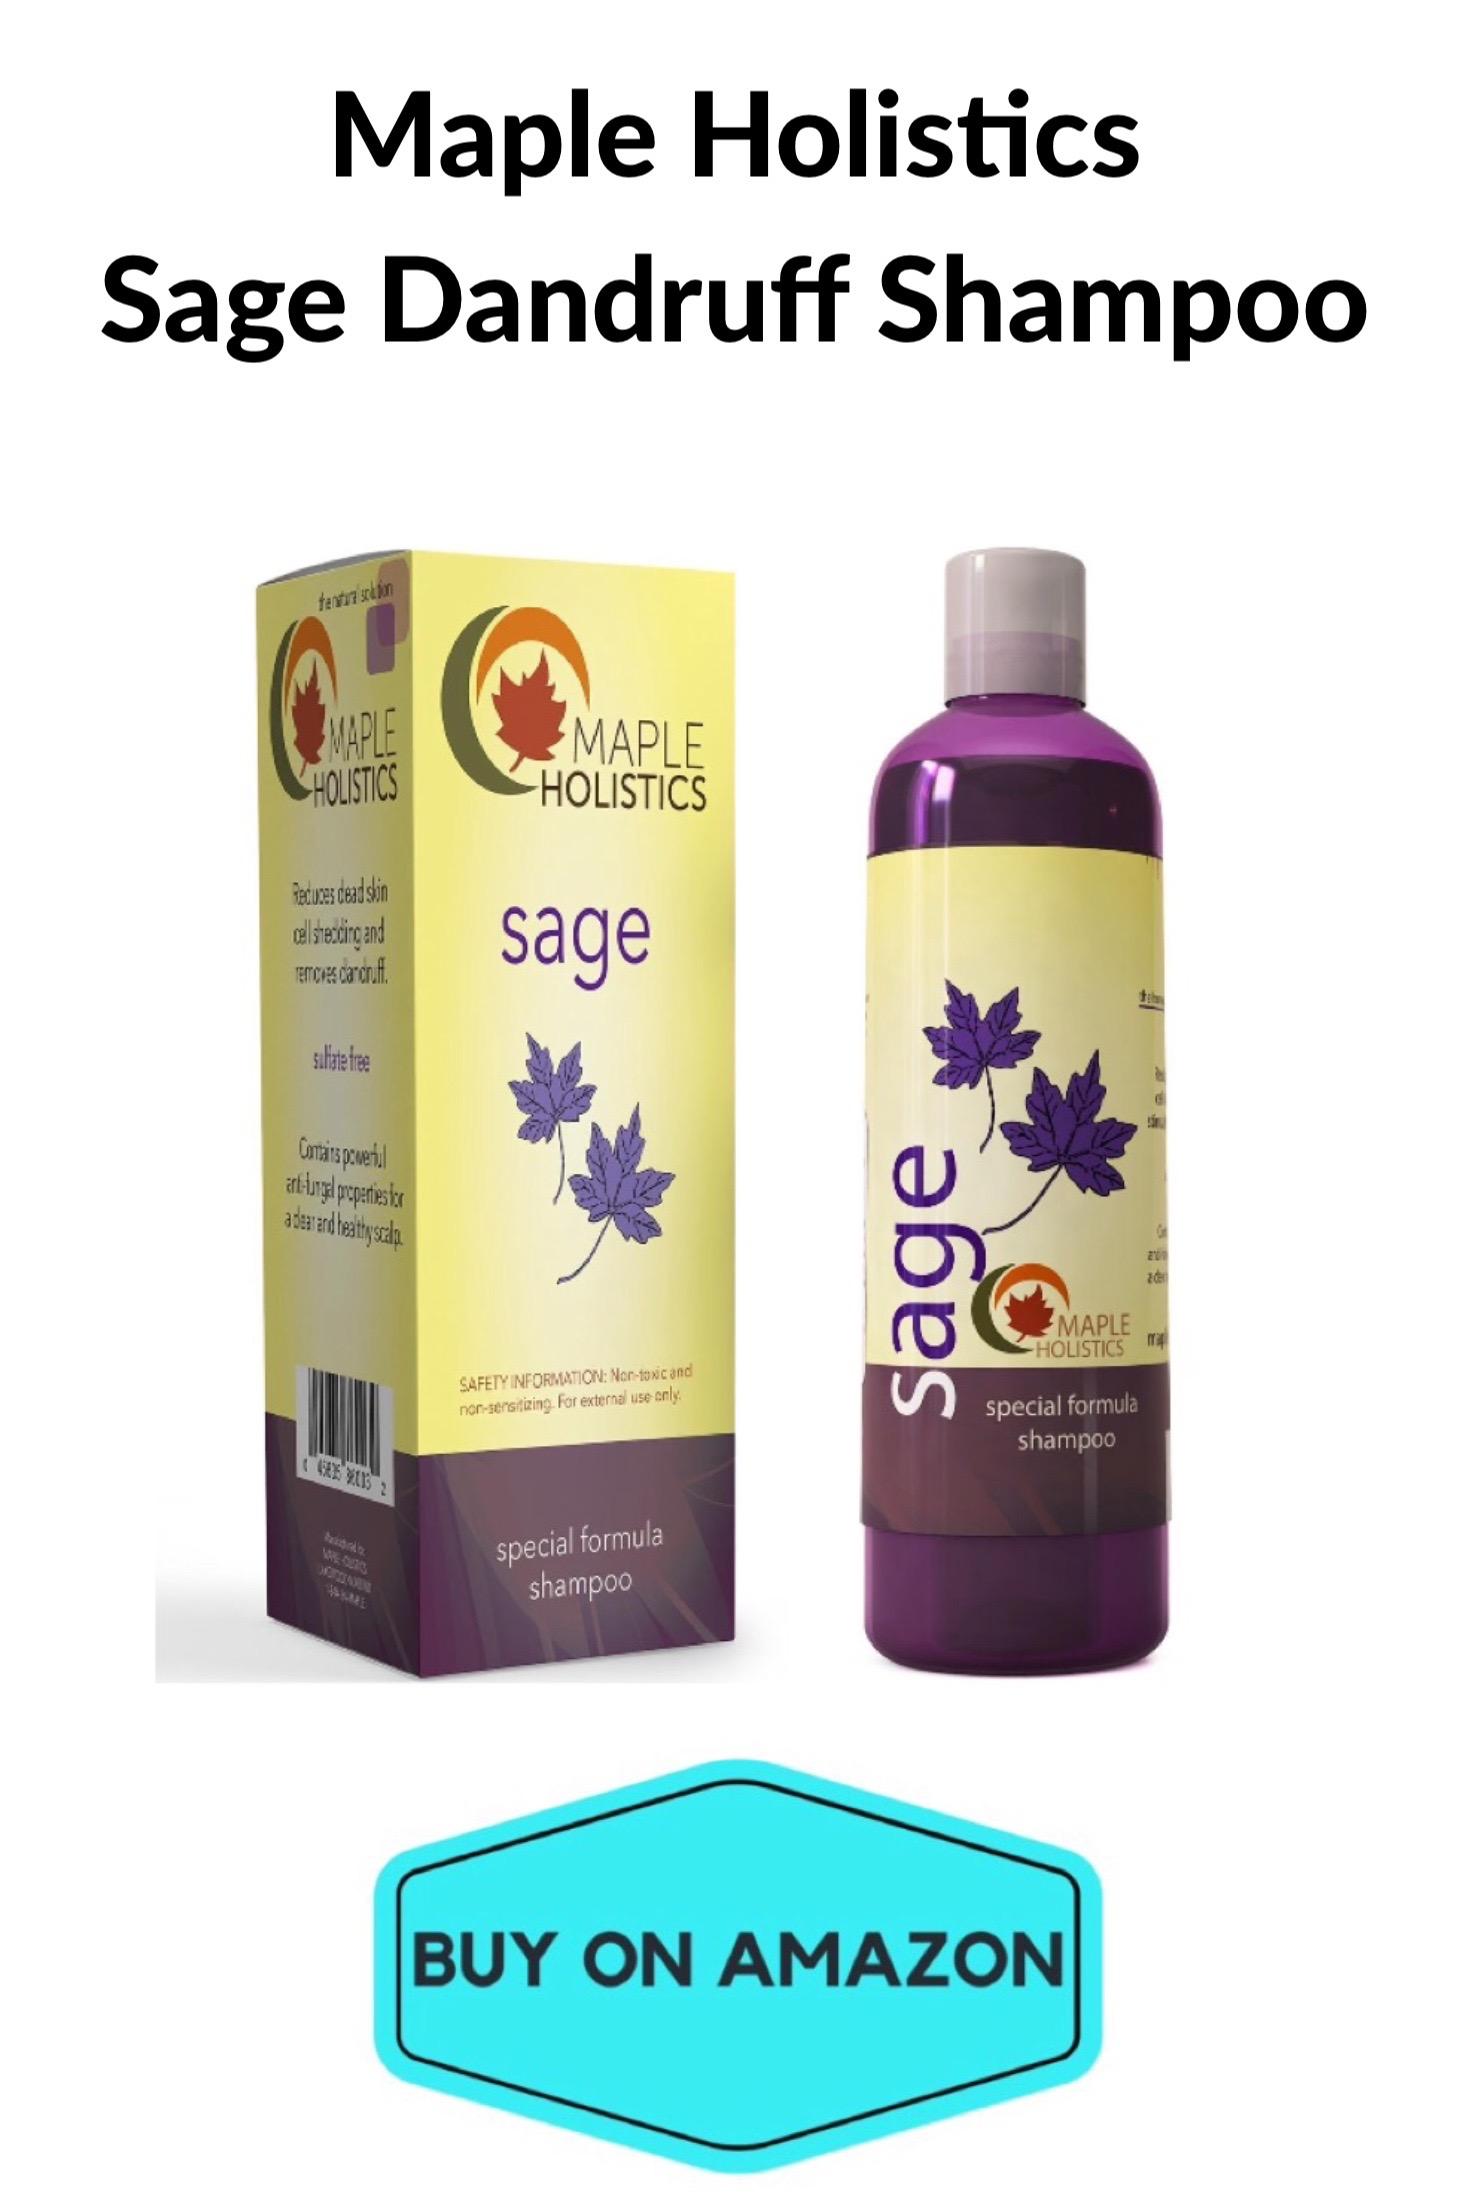 Maple Holistics Sage Dandruff Shampoo